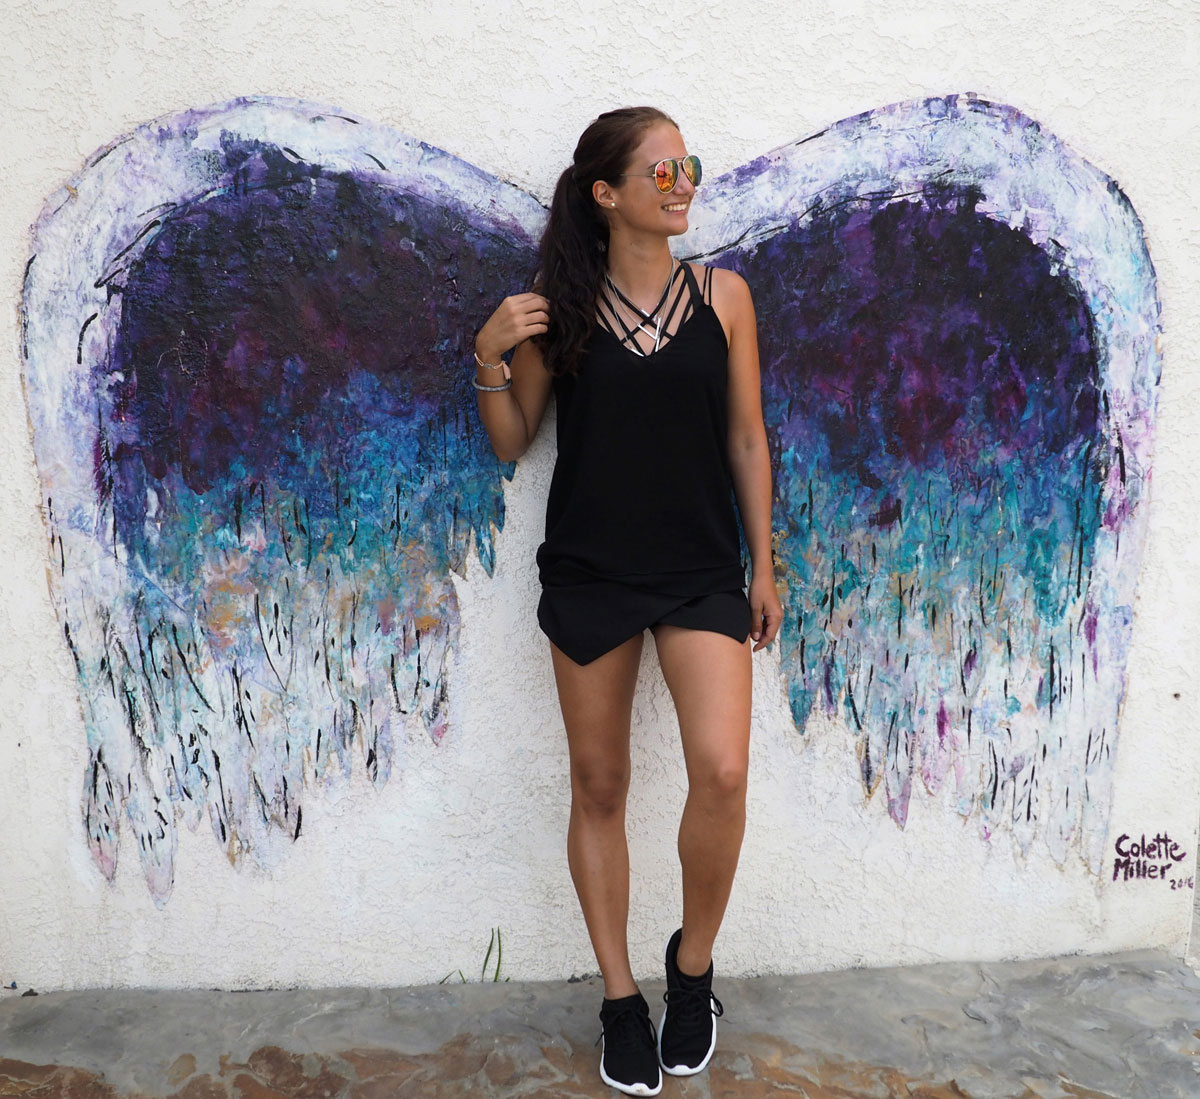 hermosa-beach-colette-miller-angel-wings